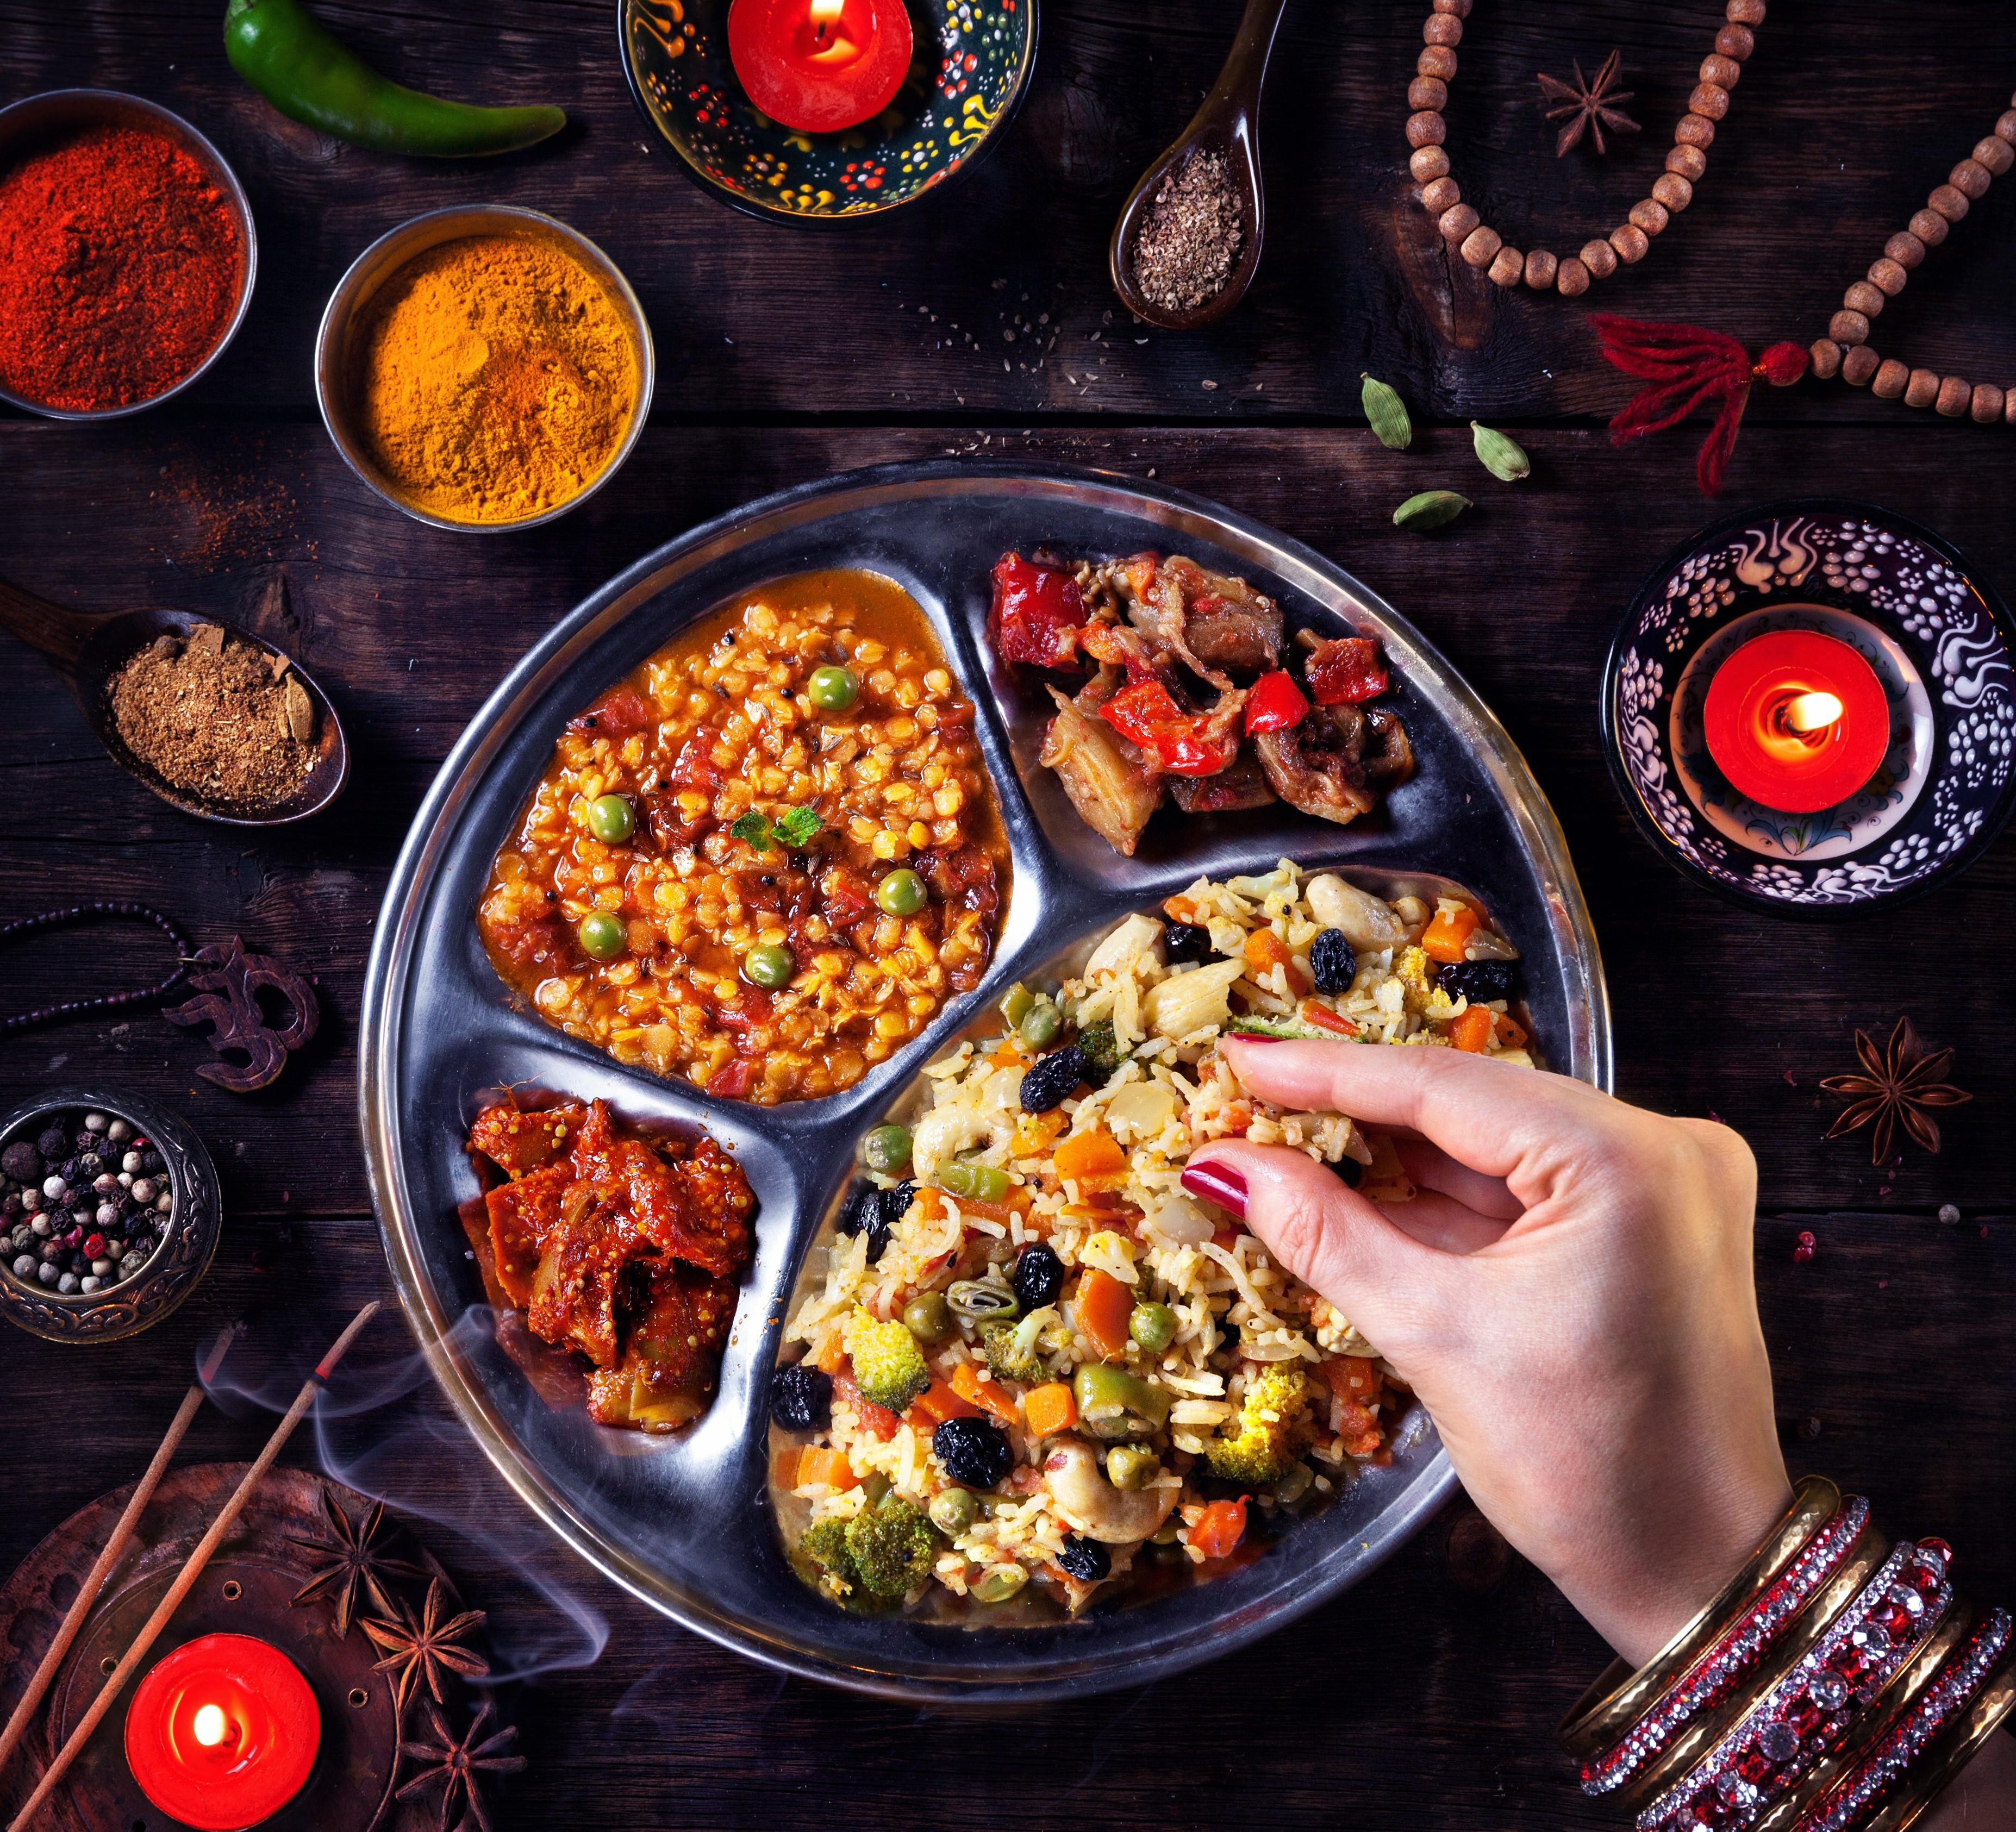 636618942209296689Diwali-celebration-food-493735010_3709x3709.jpeg